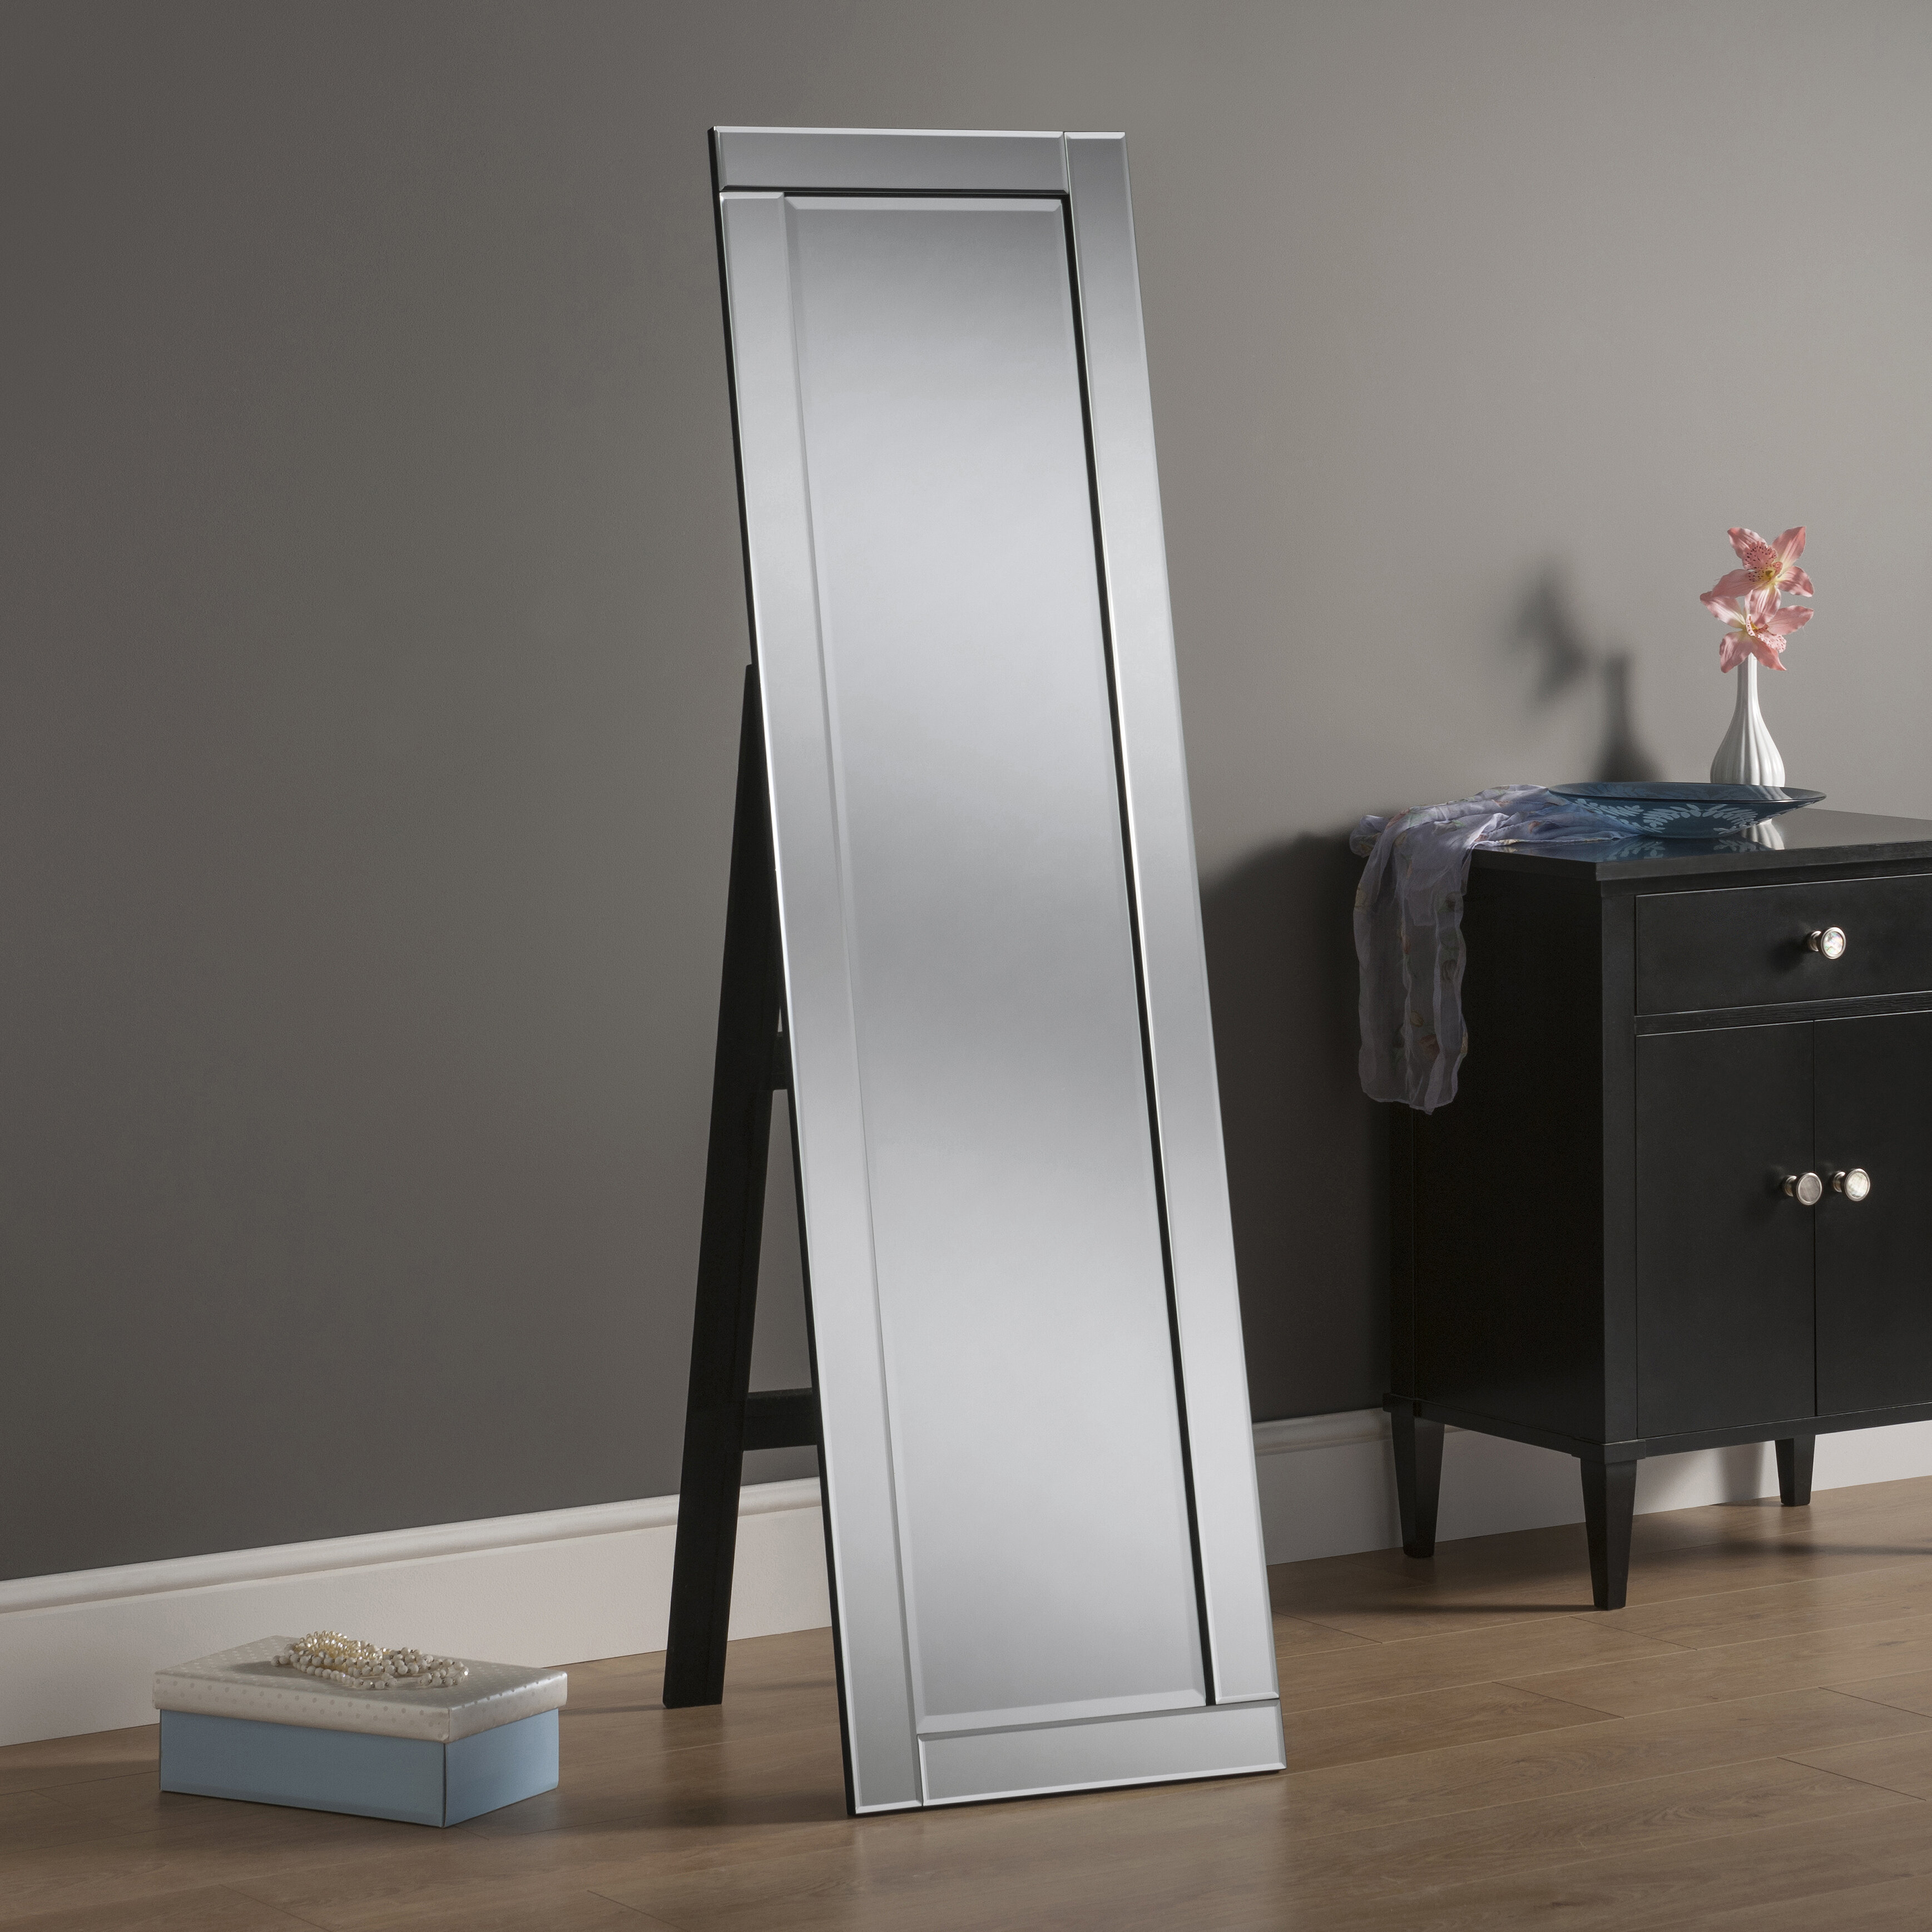 Yearn Mirrors Extralanger Spiegel & Bewertungen | Wayfair.de